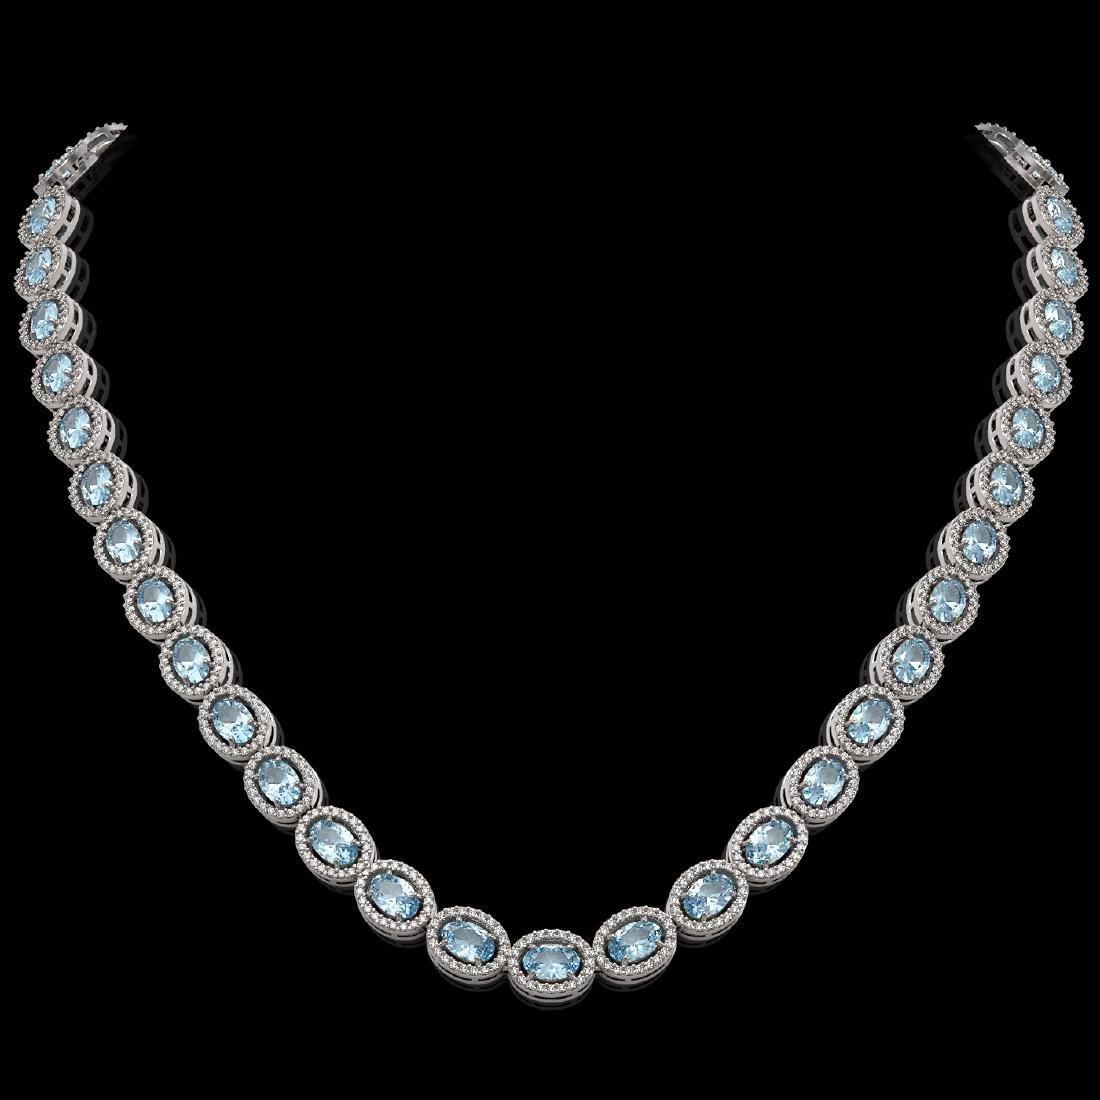 24.65 CTW Aquamarine & Diamond Halo Necklace 10K White